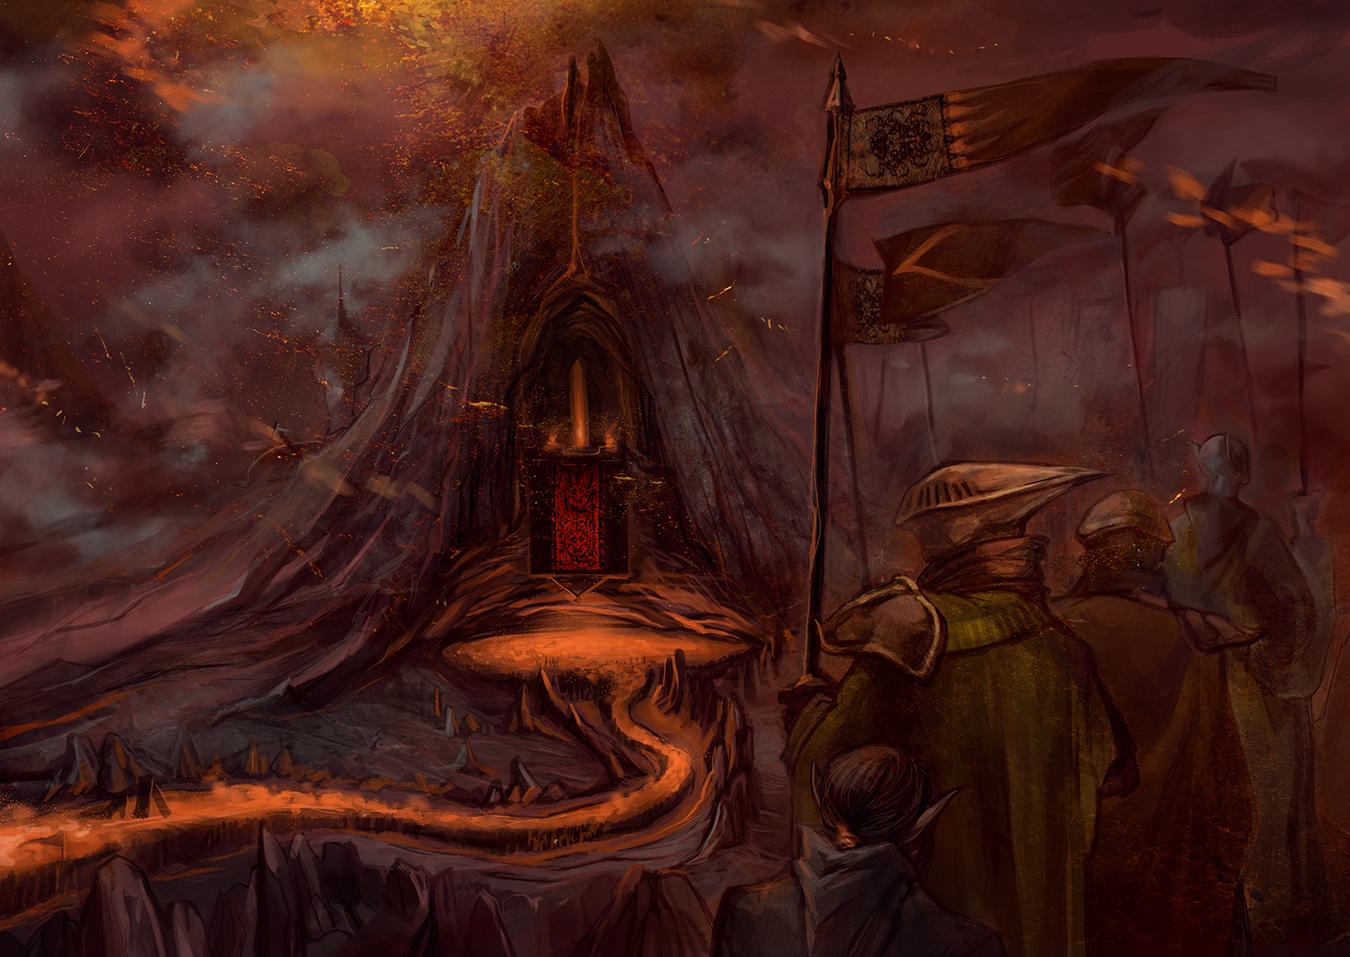 Inside Iphone X Wallpaper The Elder Scrolls Iii Morrowind Wallpaper And Background